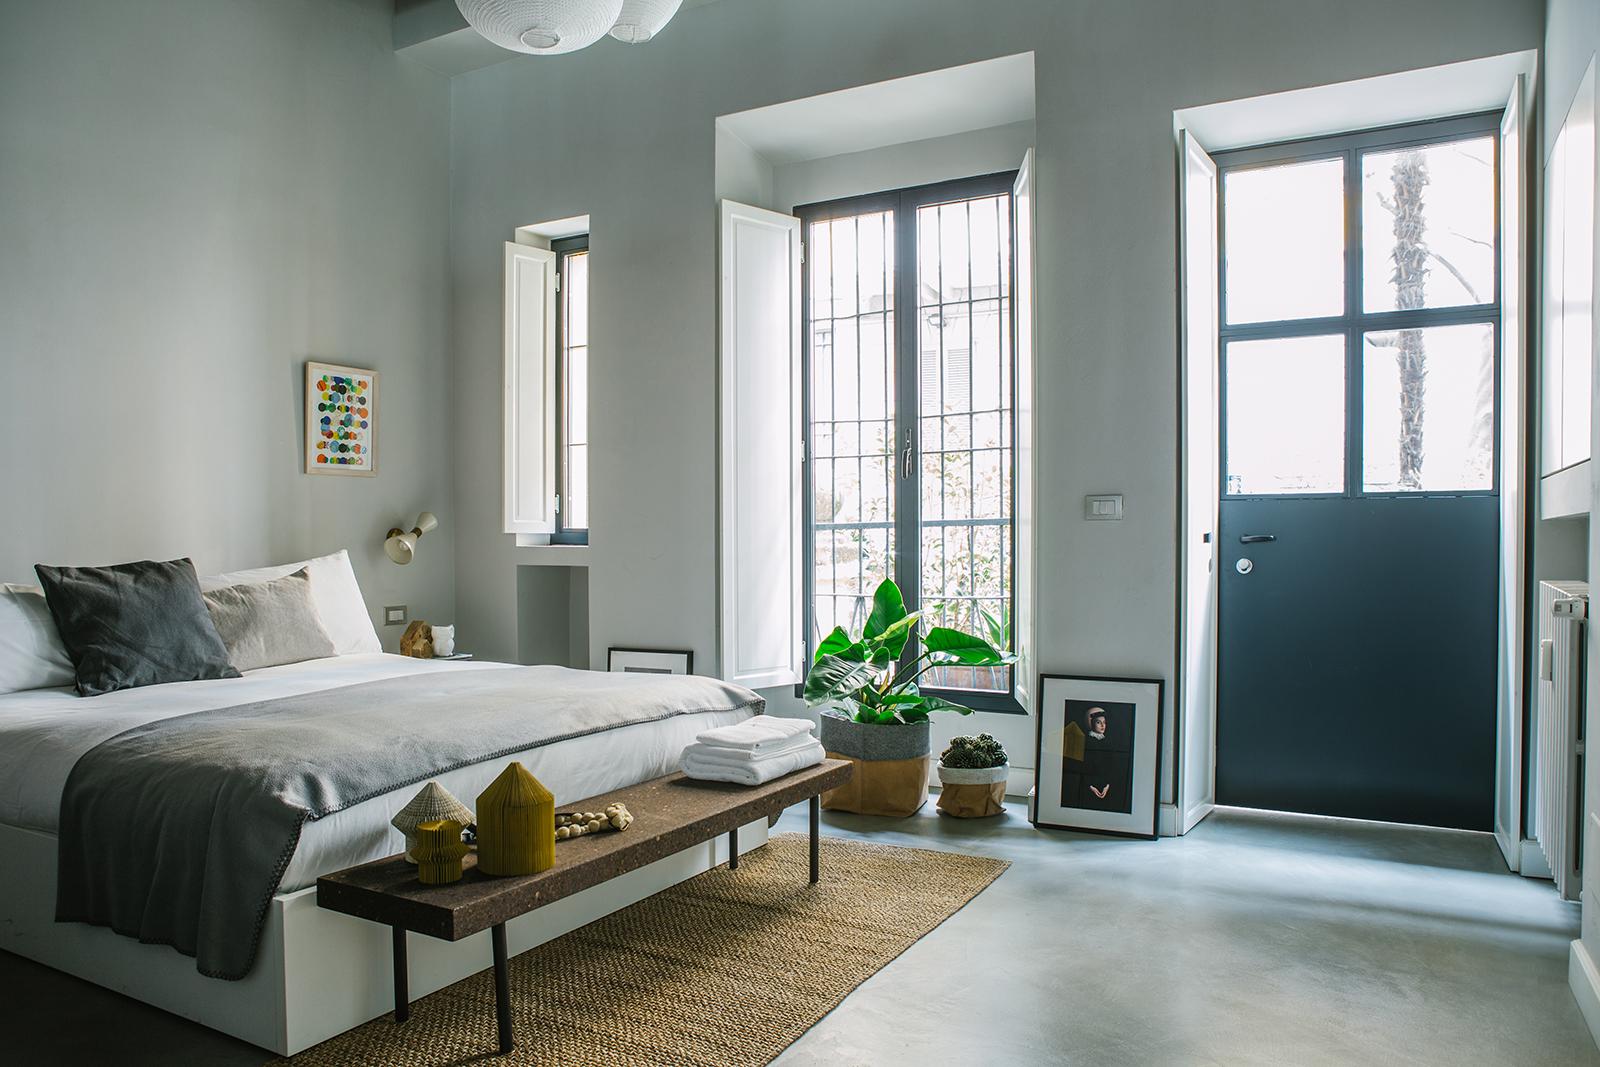 Travel: Apartment To Rent U2013 The Greenhouse, Milano